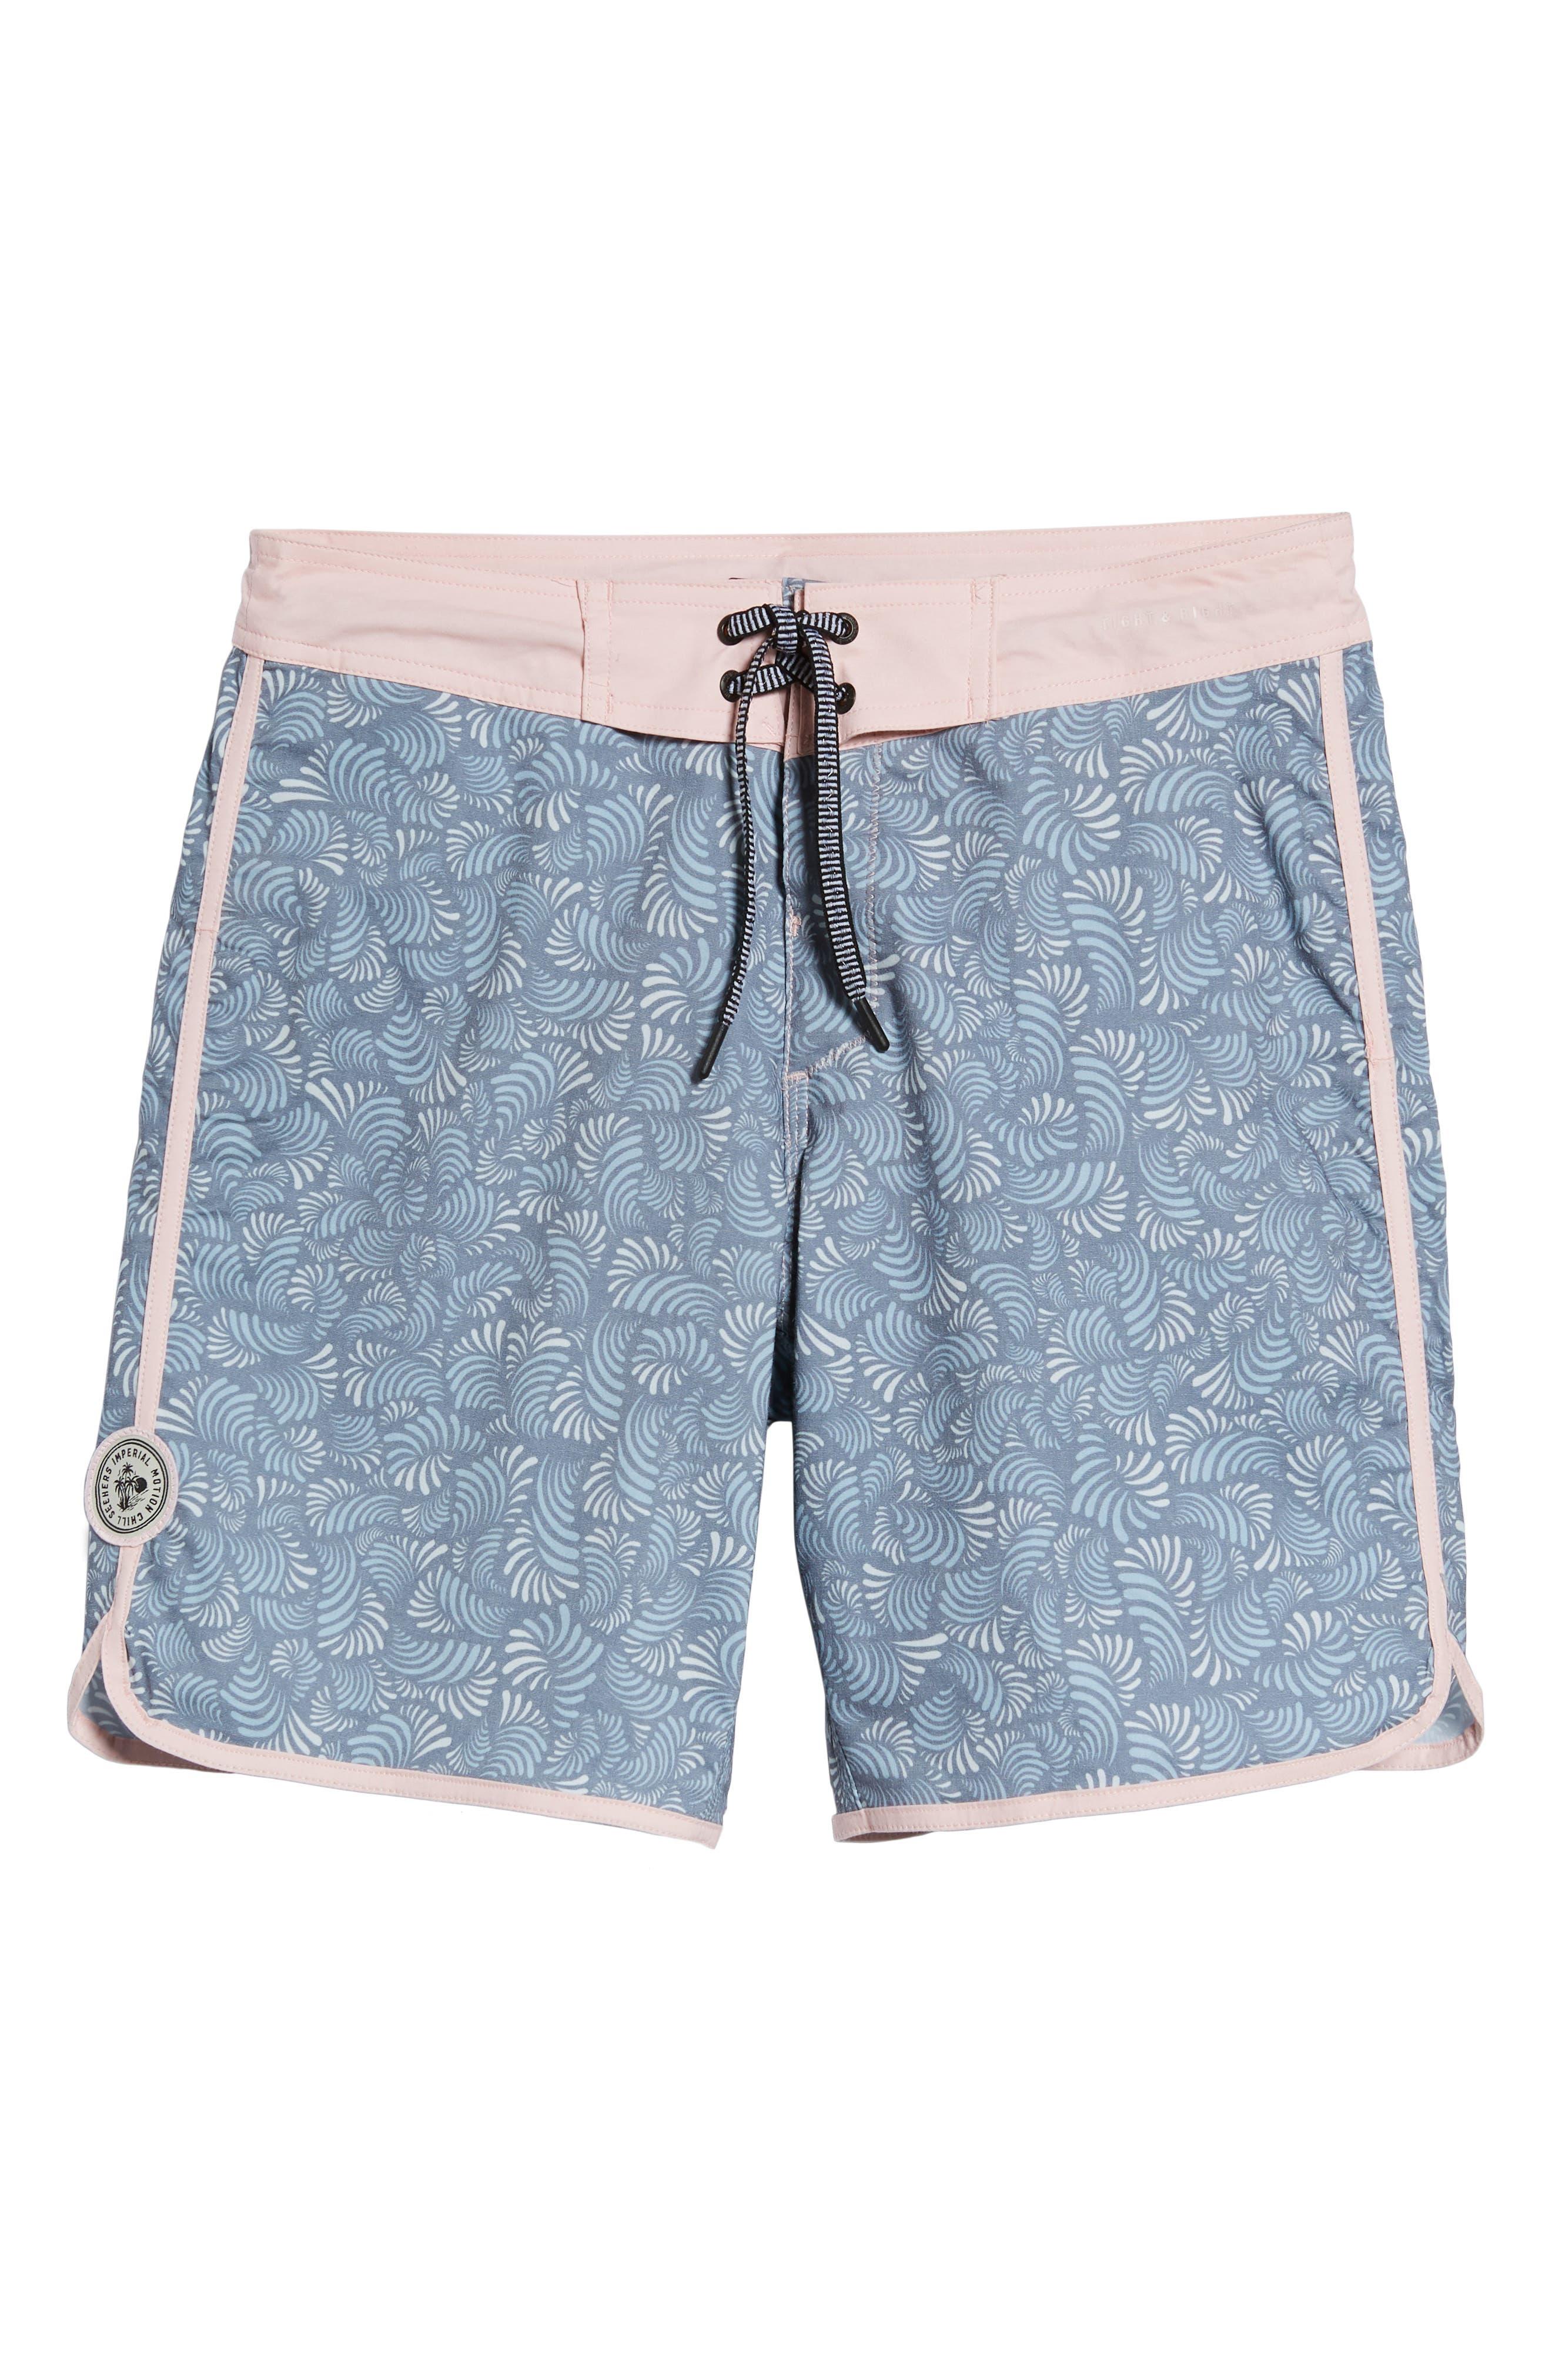 Seeker Board Shorts,                             Alternate thumbnail 6, color,                             LIGHT PINK/ BLUE